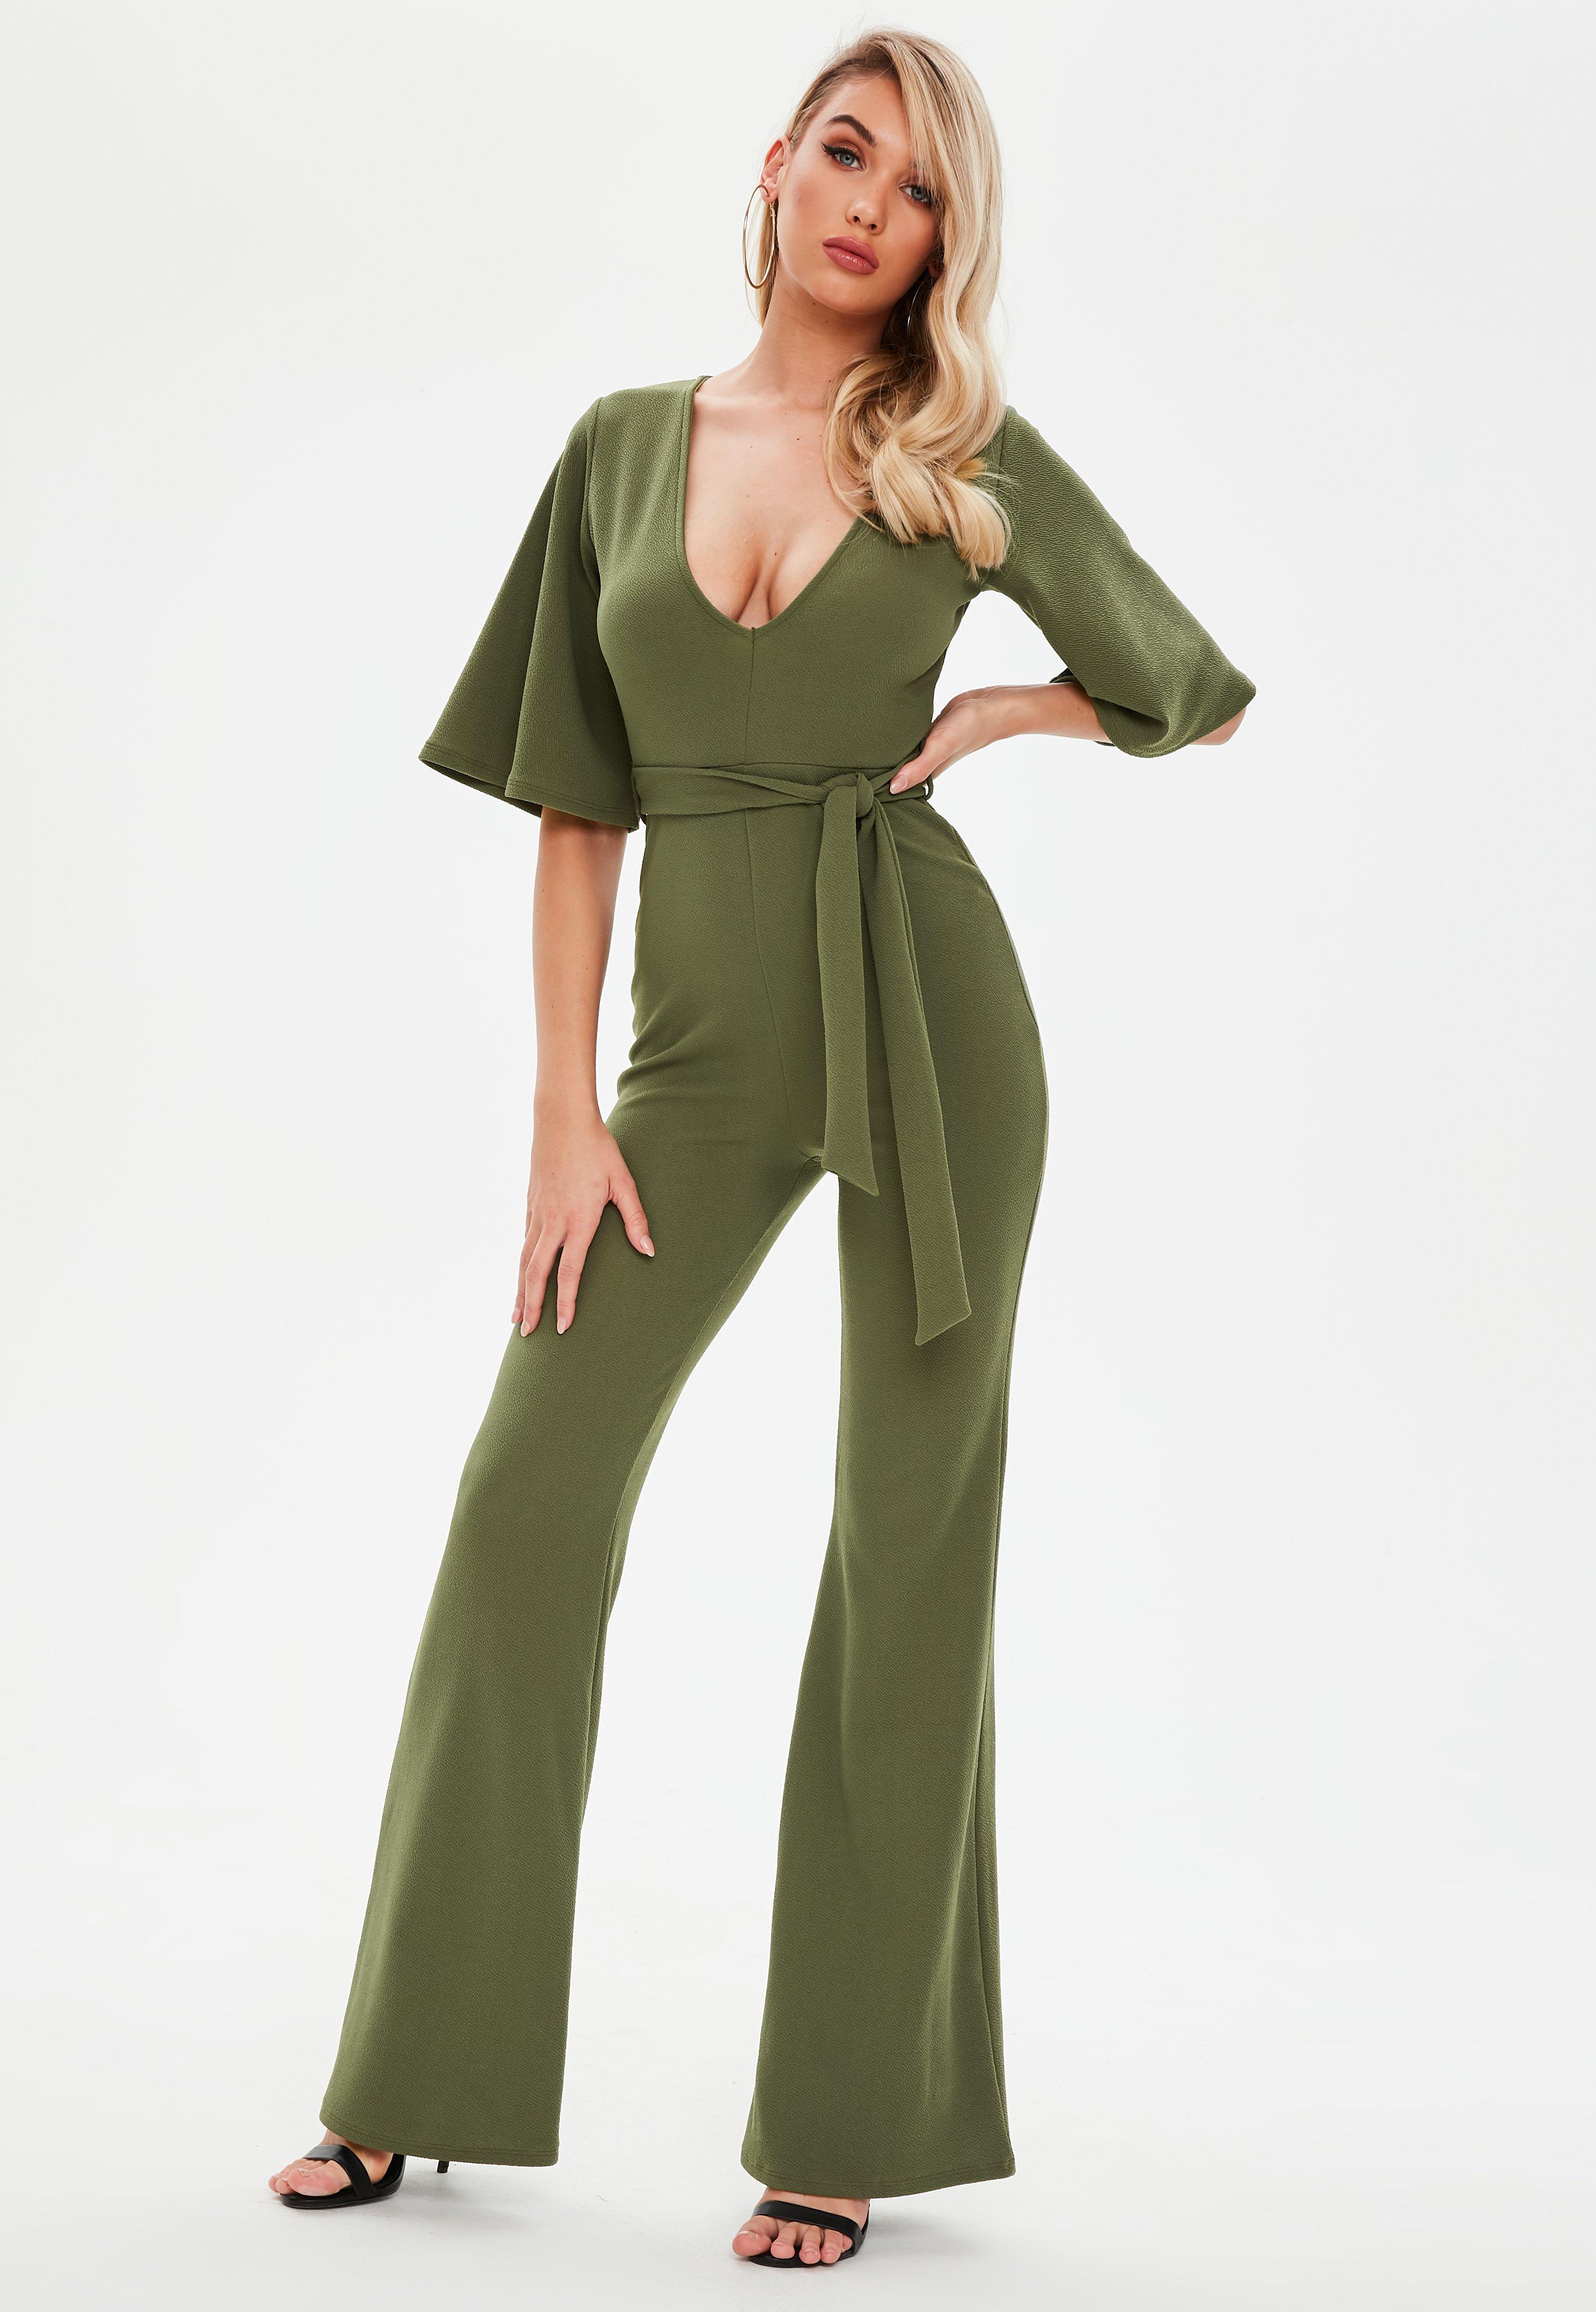 42243f76446 Lyst - Missguided Khaki Plunge Kimono Sleeve Jumpsuit in Green